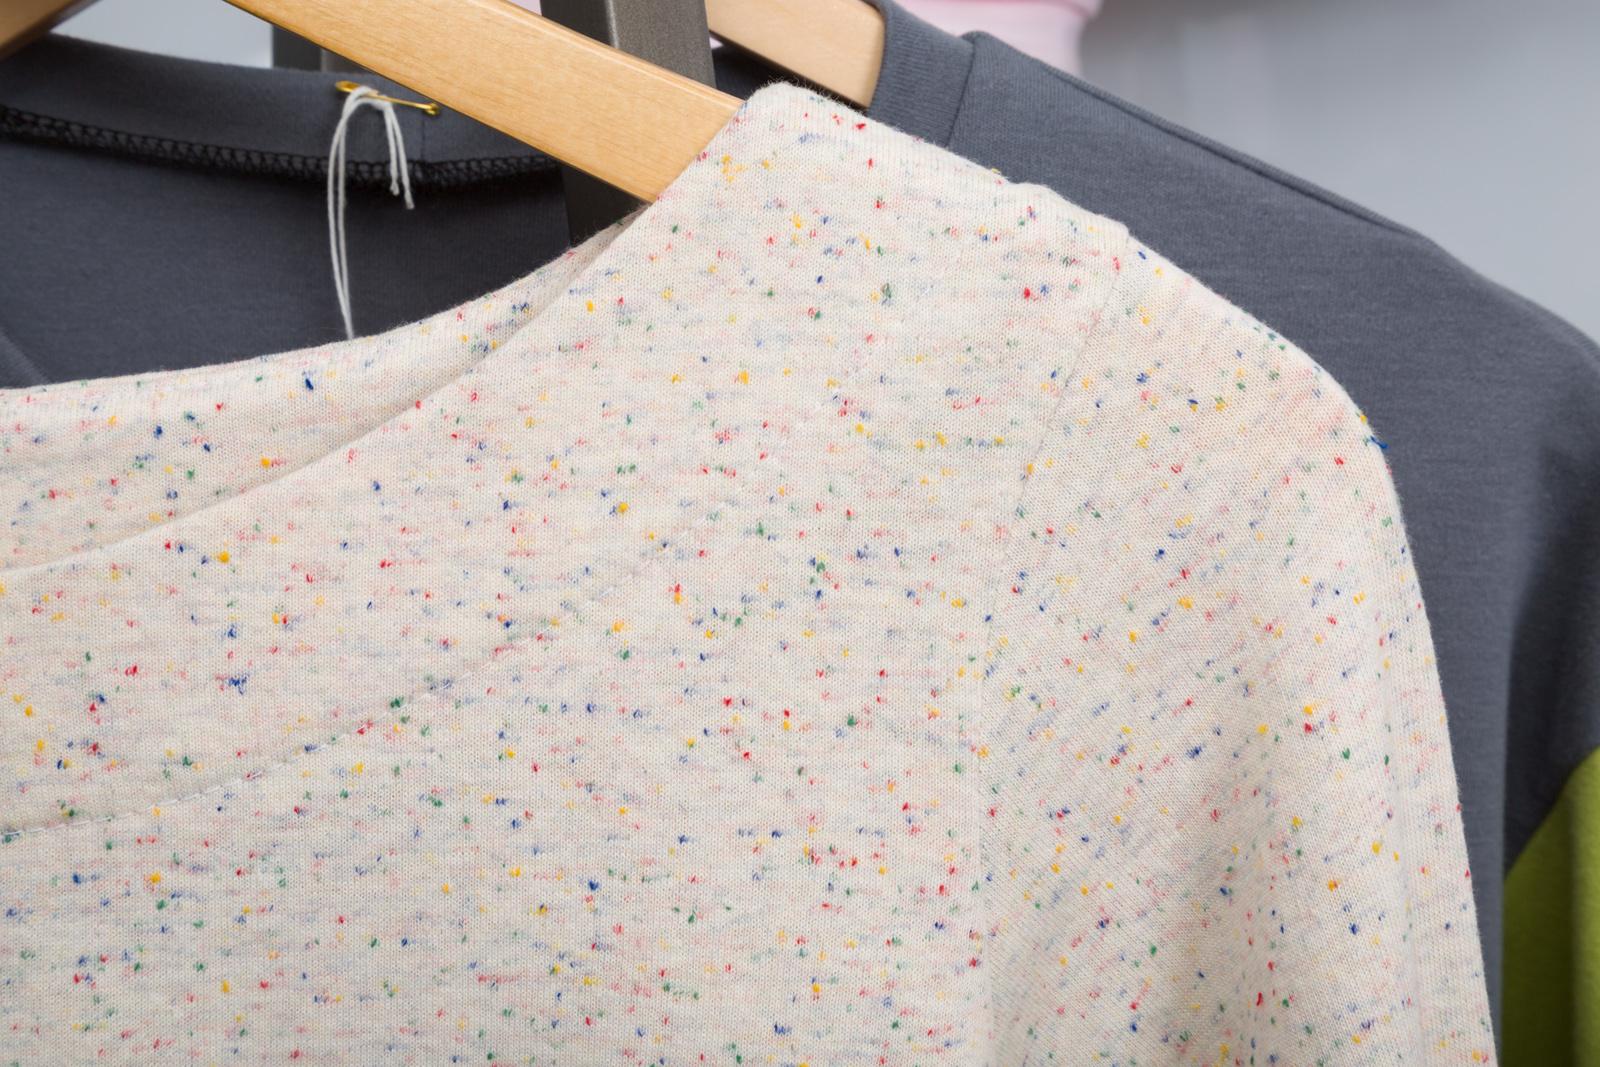 Shoreline Boatneck Tee   by   Blank Slate Patterns ,  made by    Devon Iott   , featuring   Speckle Cotton Jersey.